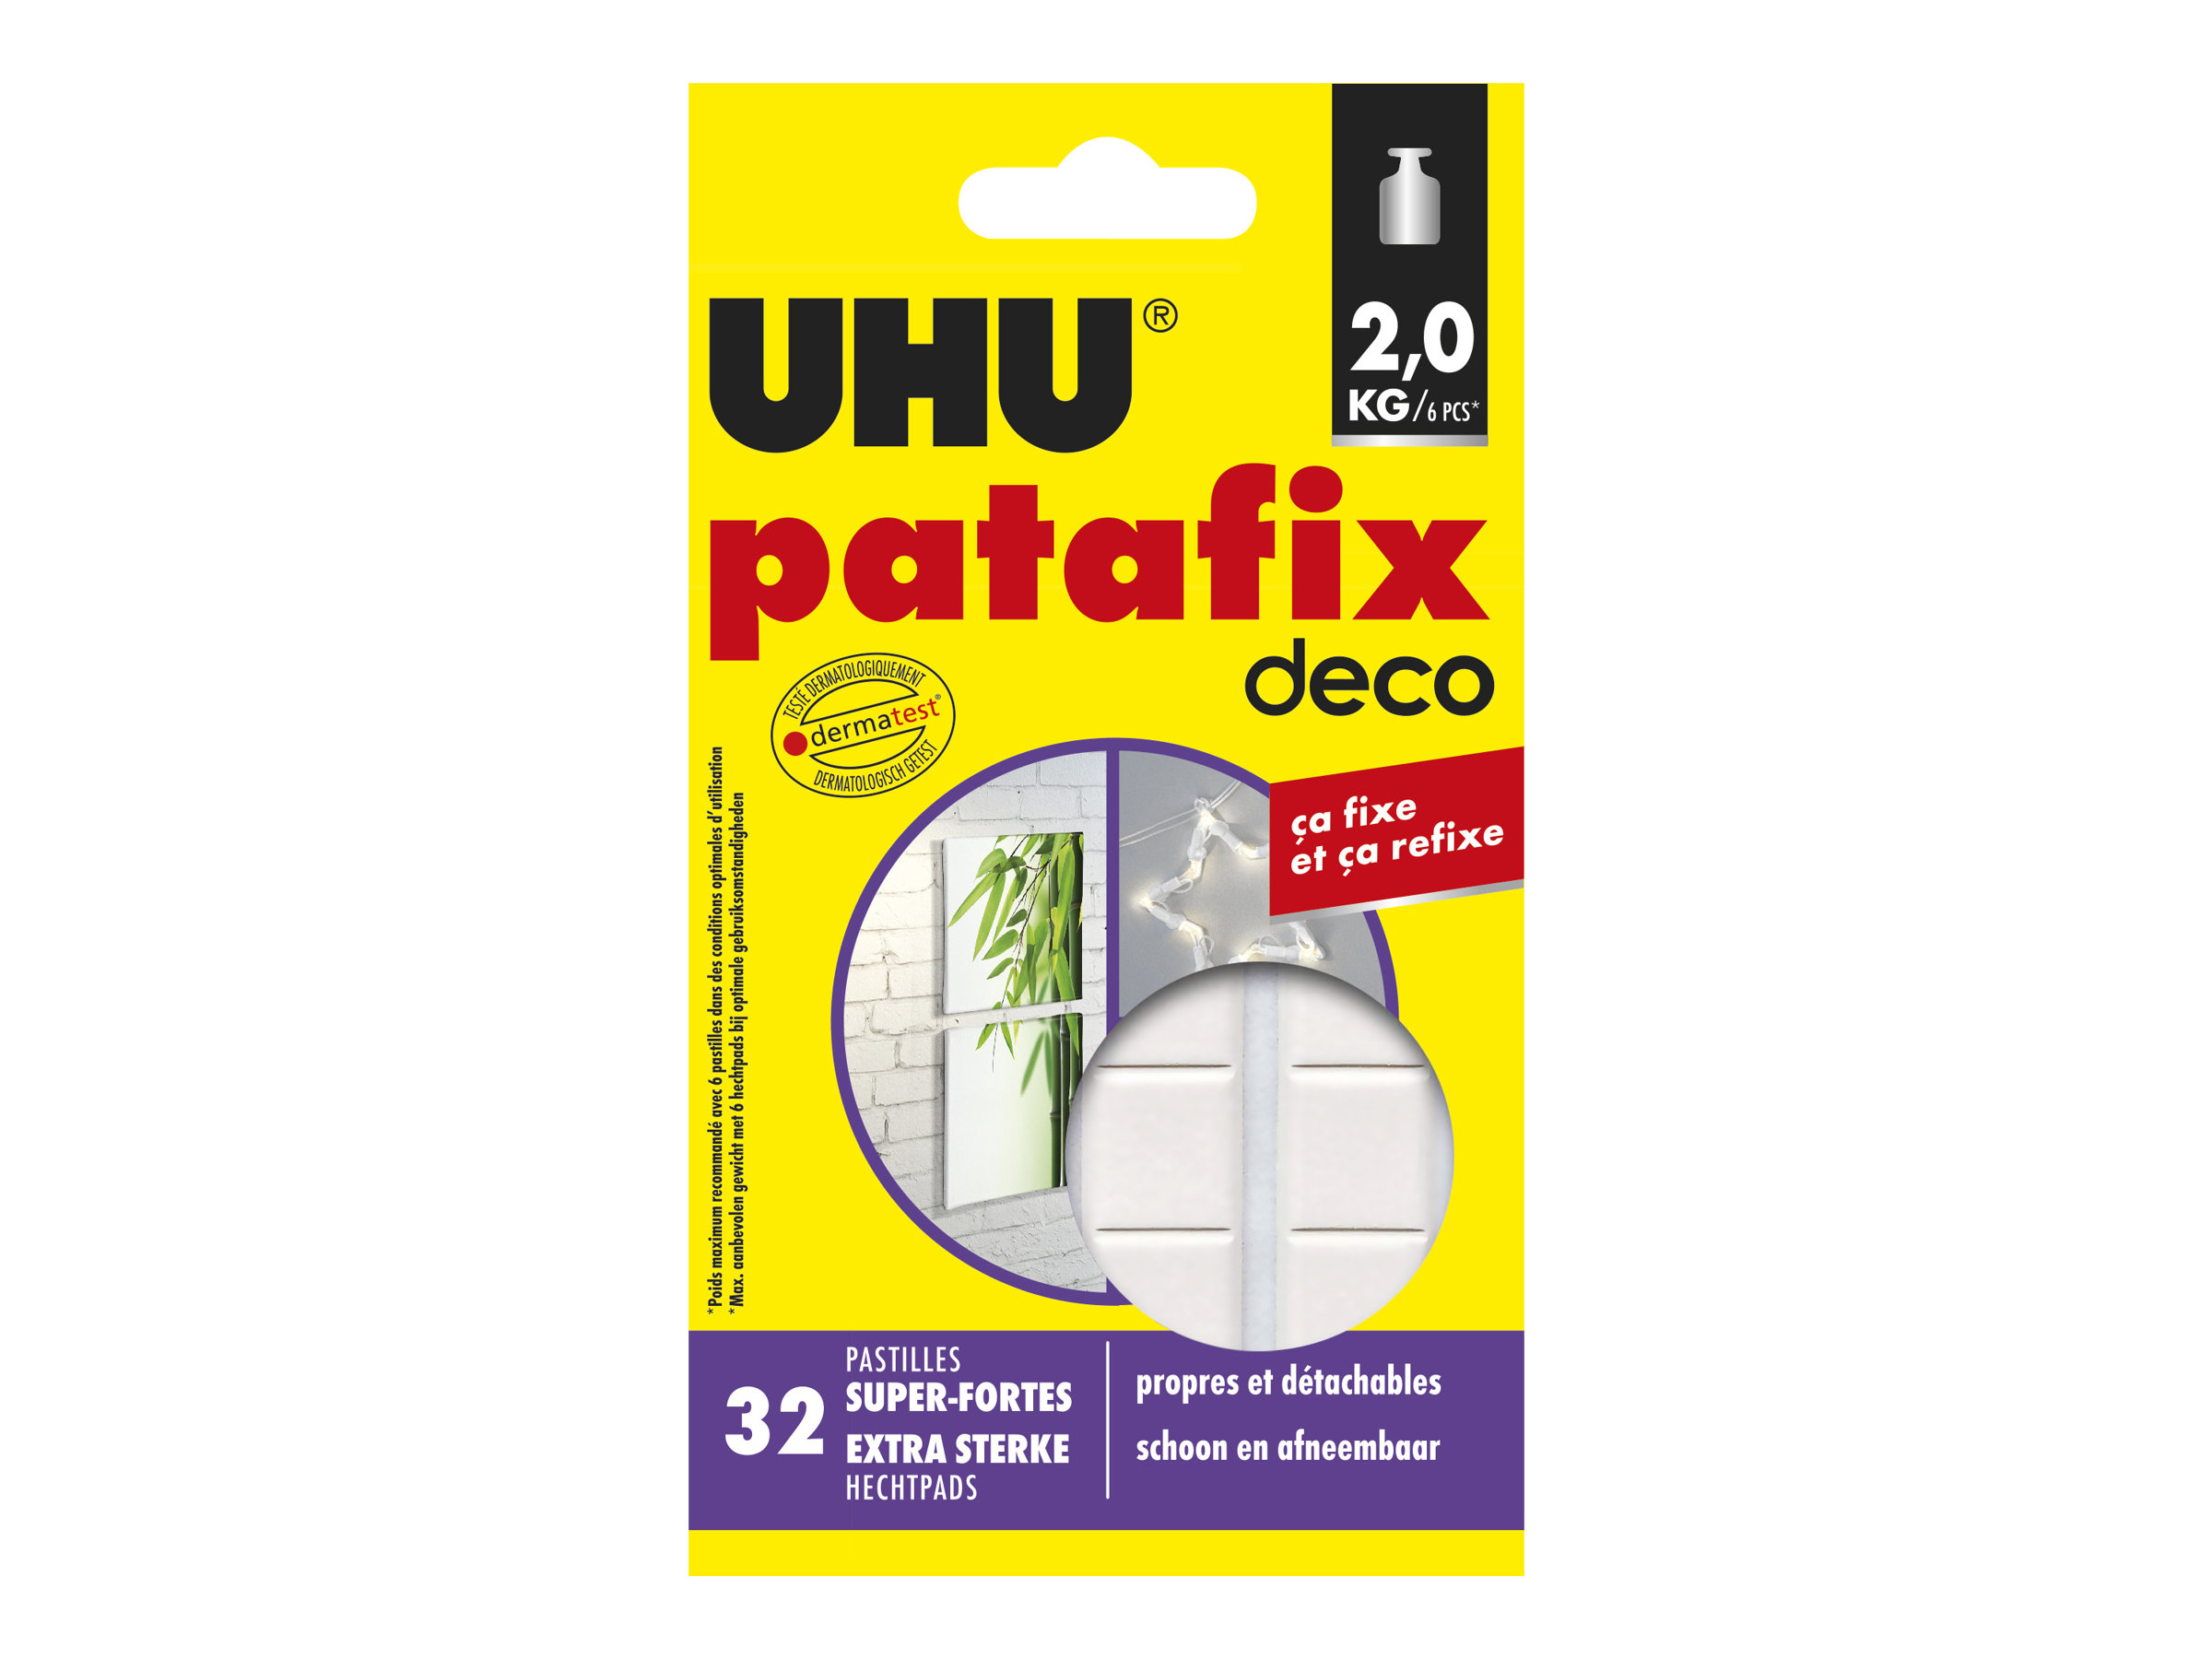 UHU patafix homedeco - adhésif de montage